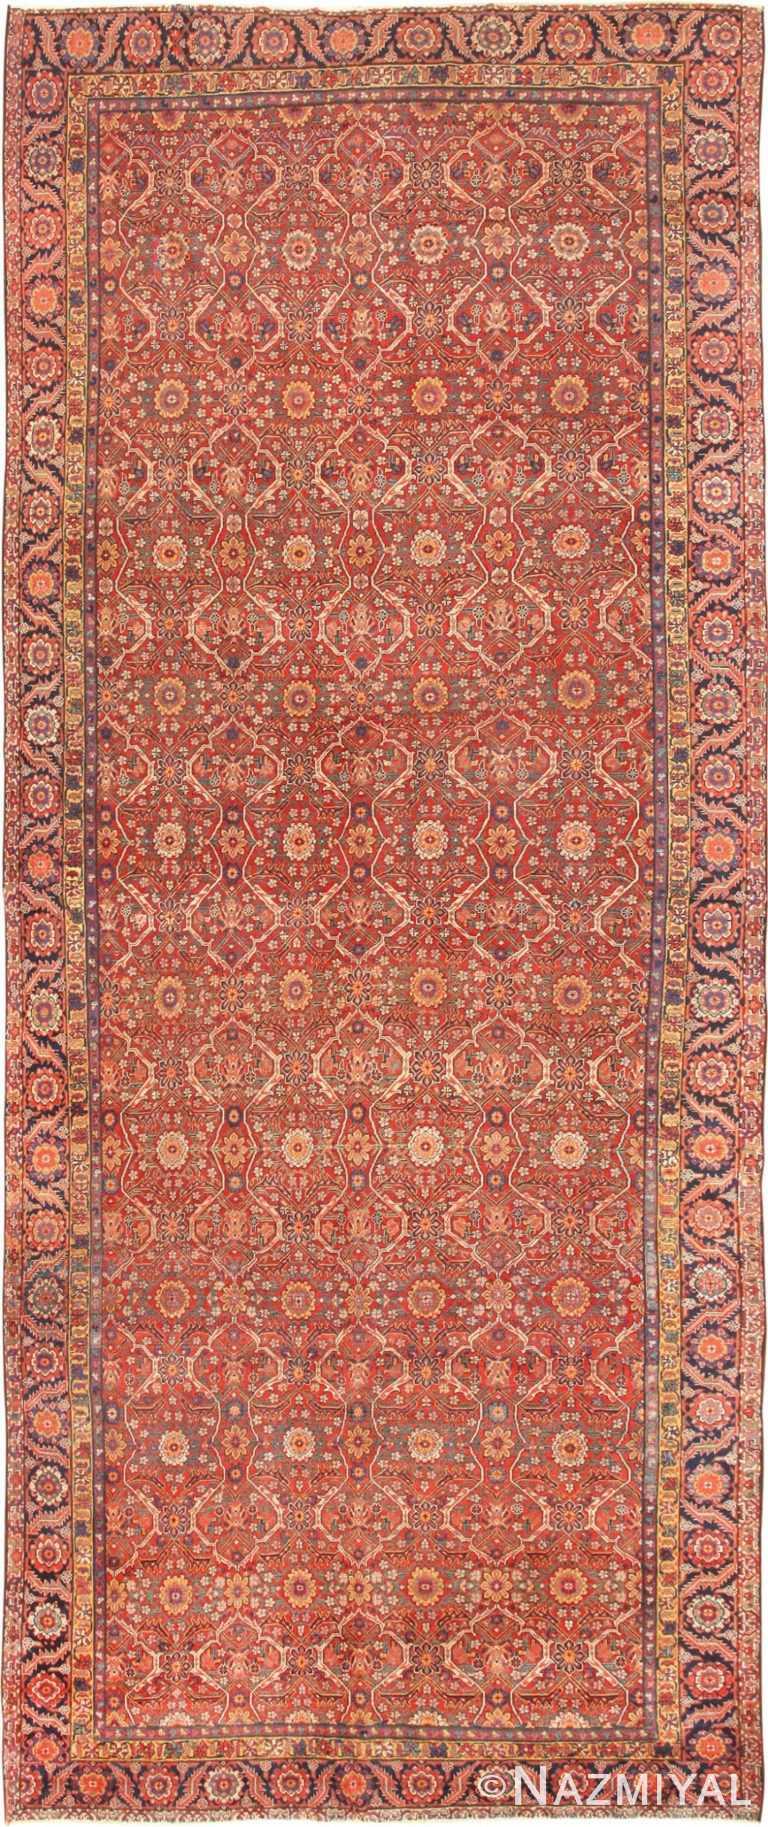 Antique Persian Farahan Carpet 47201 Nazmiyal